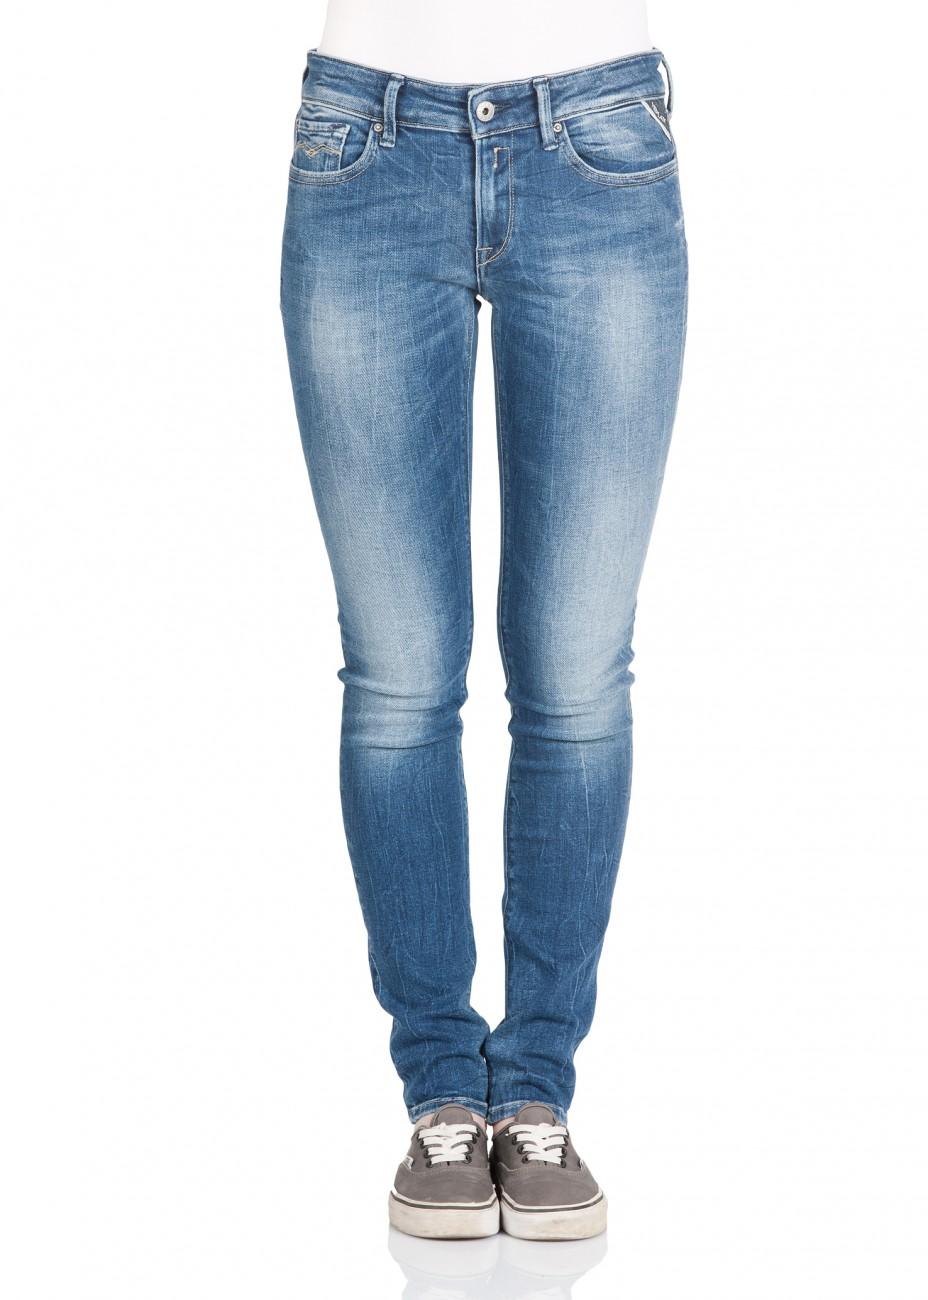 replay damen jeans luz skinny fit blau blue used. Black Bedroom Furniture Sets. Home Design Ideas